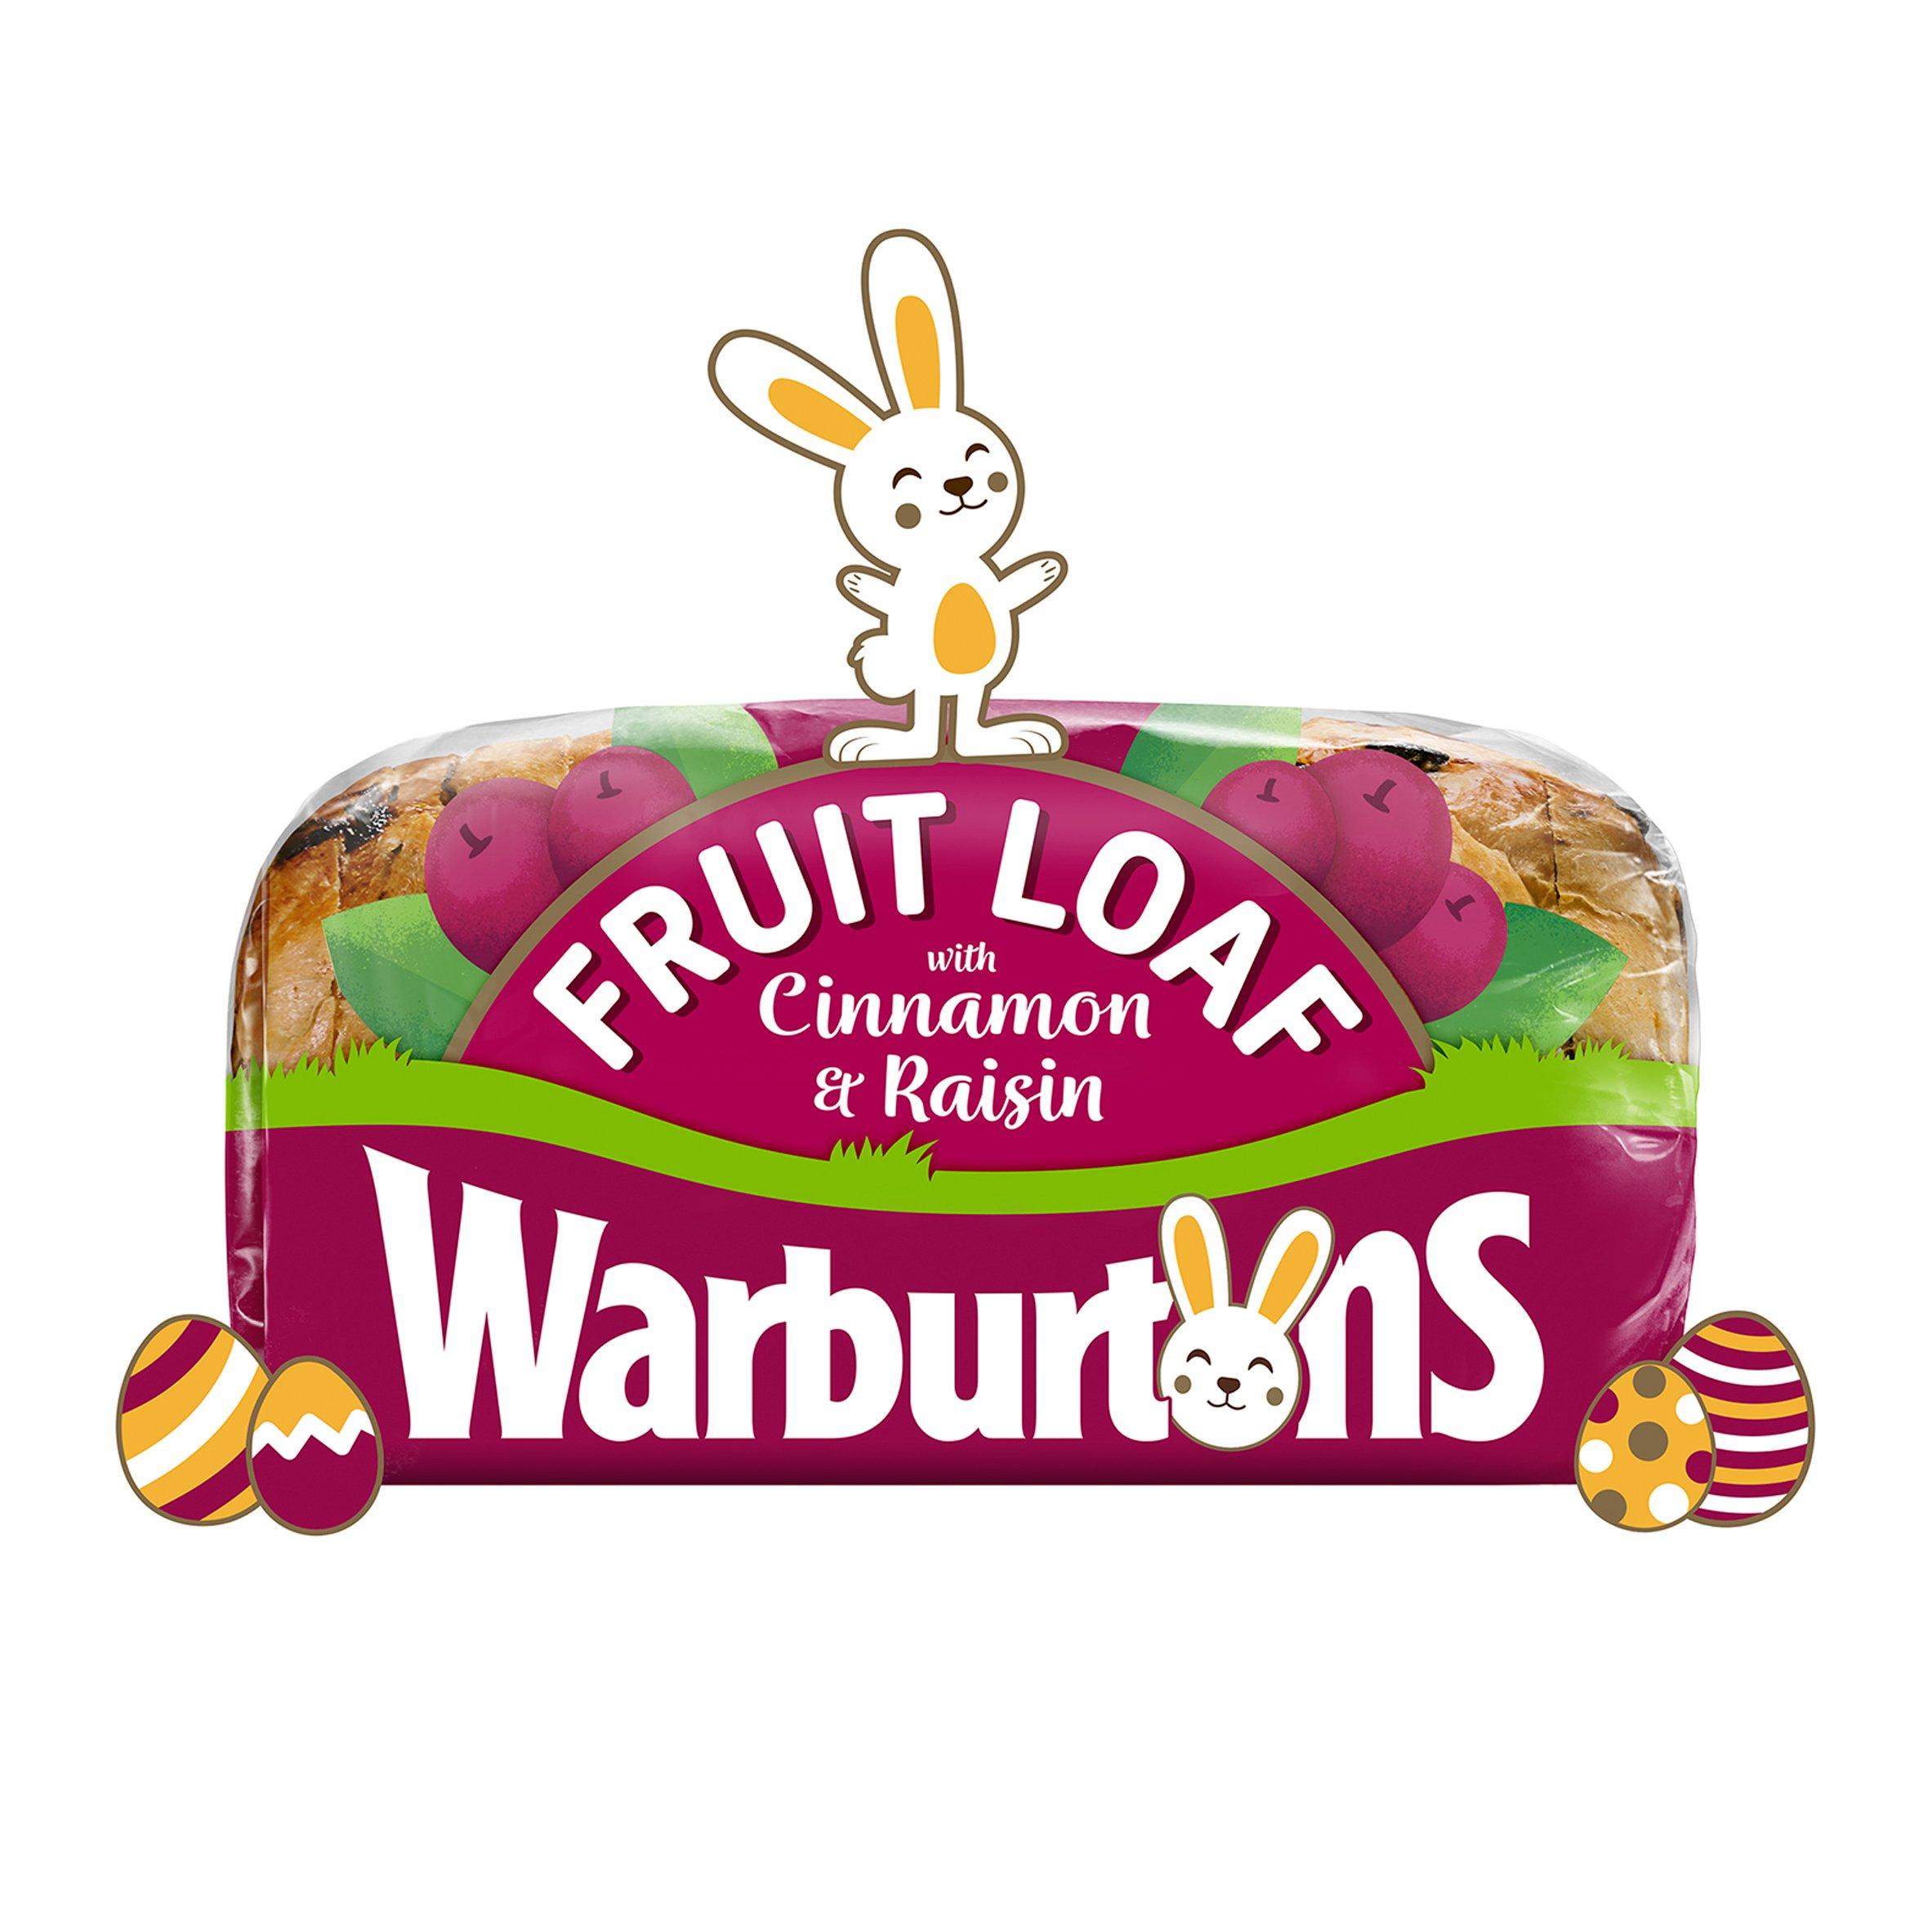 Warburtons Fruit Loaf With Cinnamon & Raisin 400G